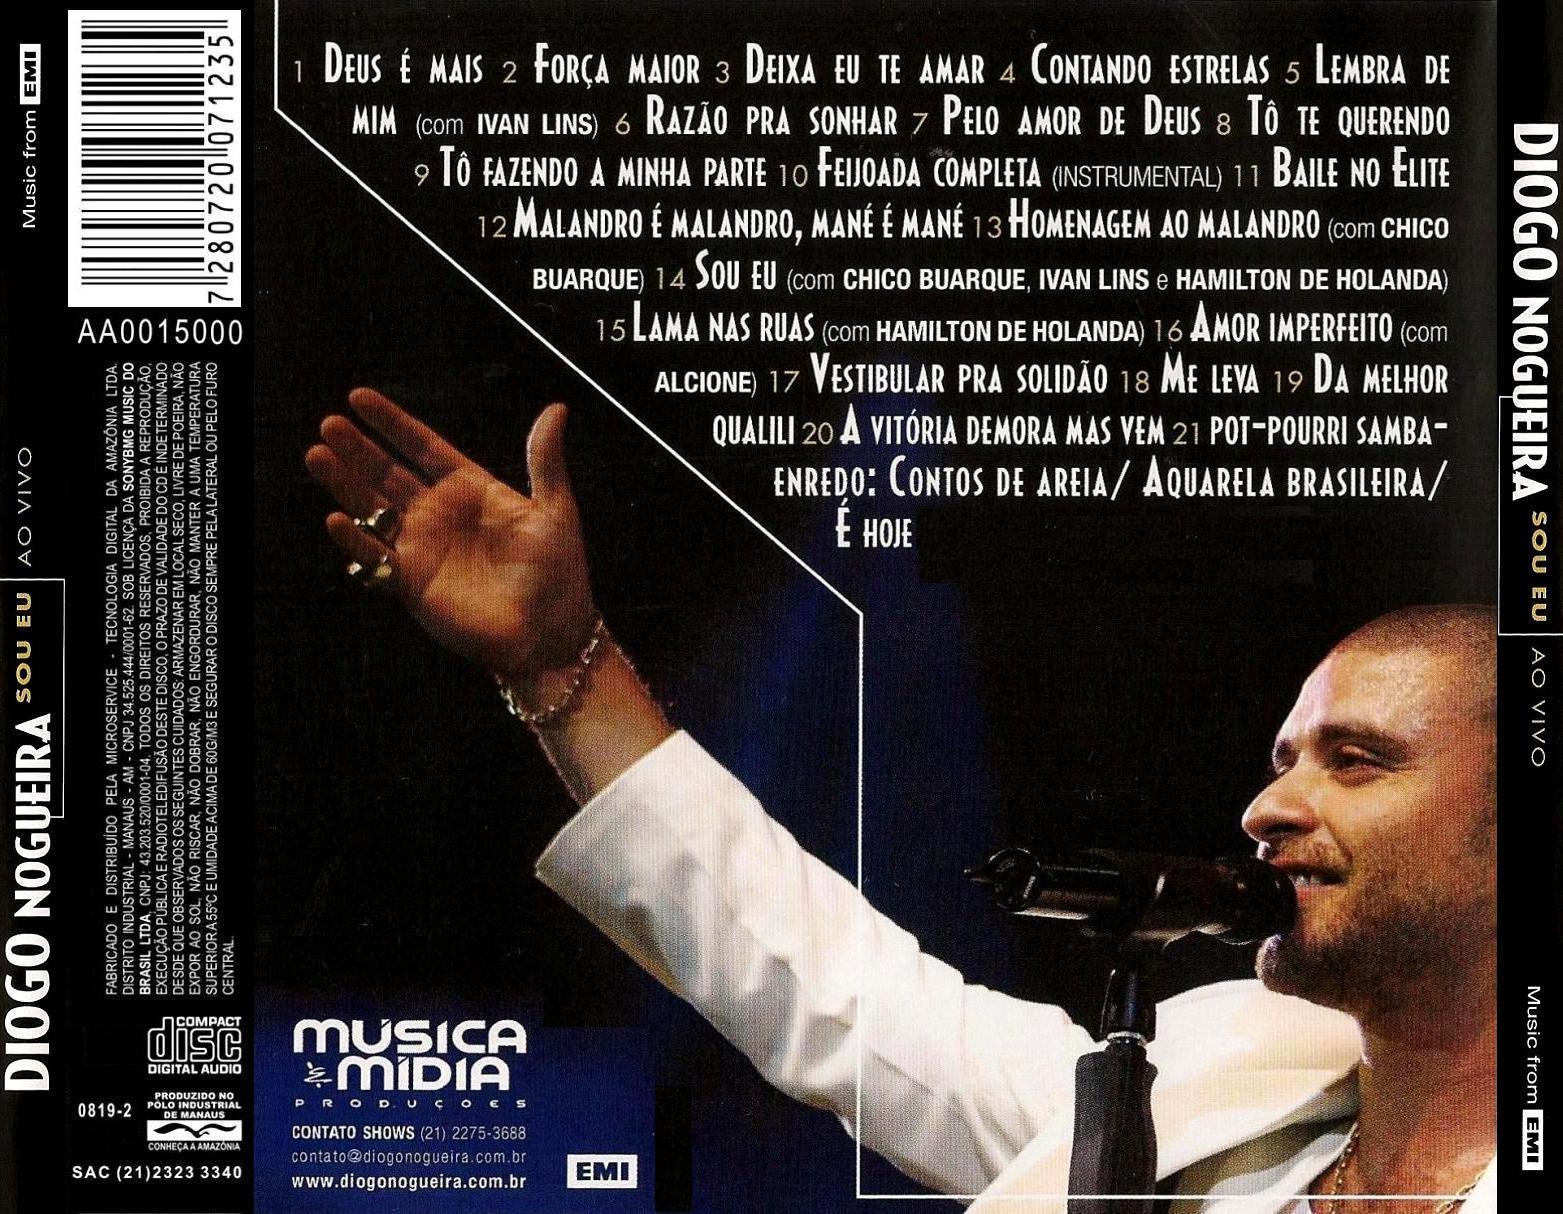 SOL DVD CD VER AUDIO BRILHAR BAIXAR PRA O BELO